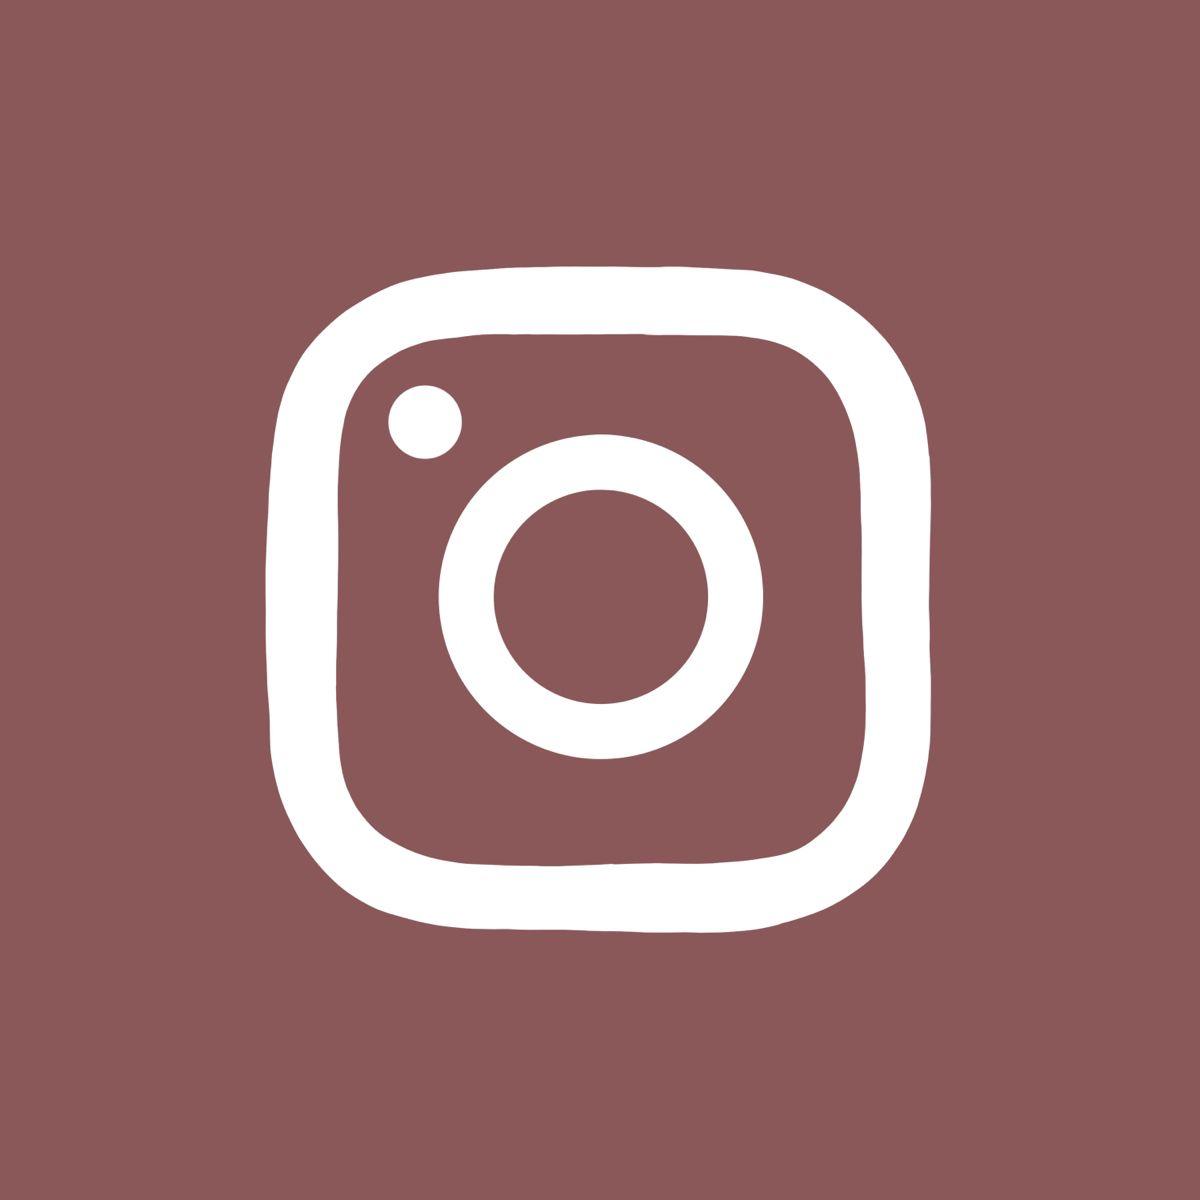 Instagram Dark Academia Gaming Logos Instagram Nintendo Switch